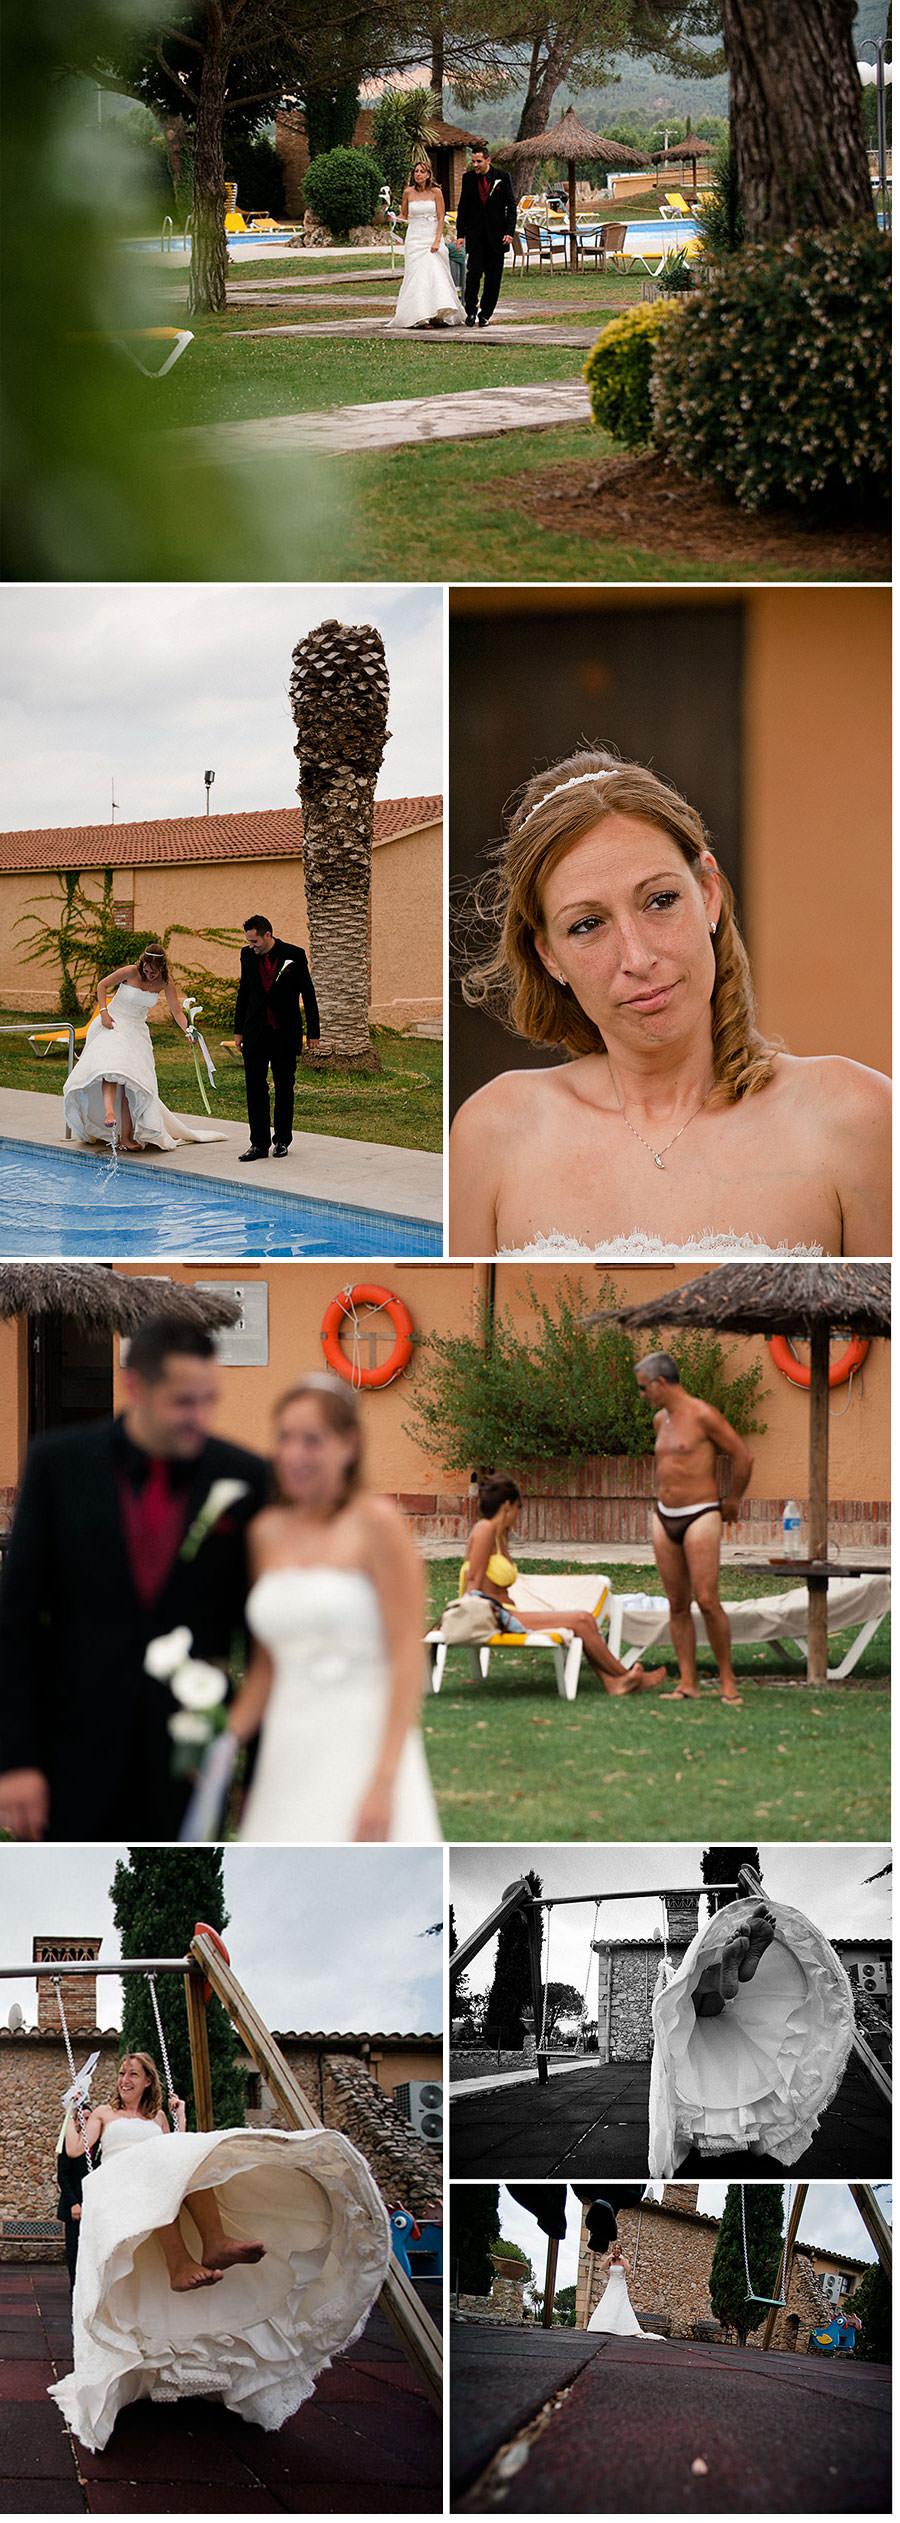 Esteban & Laura's wedding at Mas Sola, Santa Coloma de Farners, Spain. 171